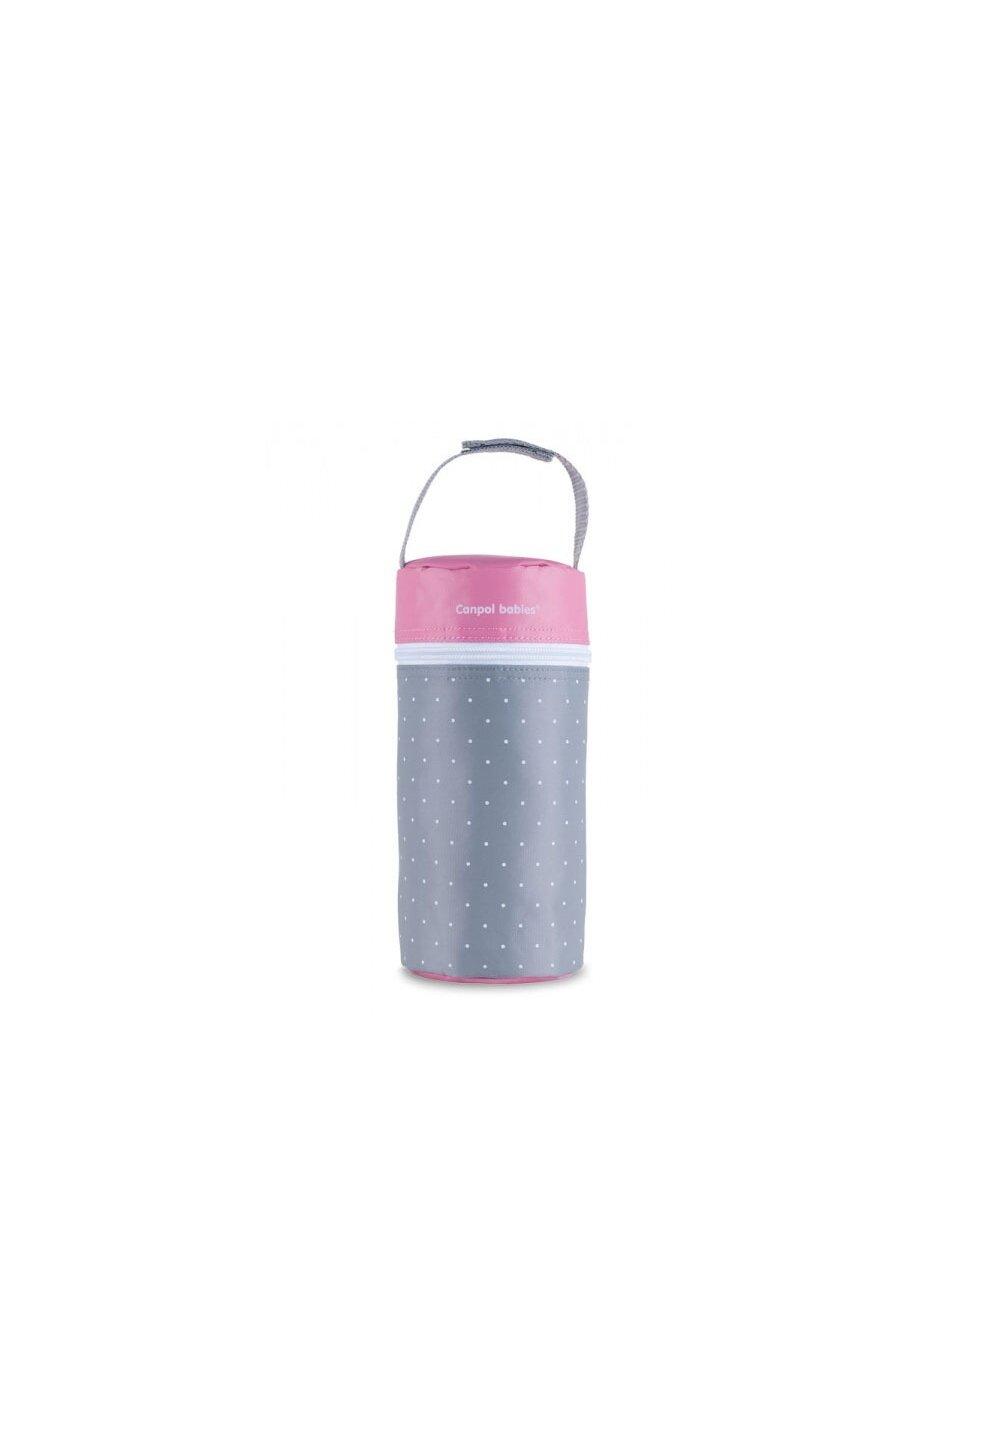 Izolator pentru biberoane, gri cu roz imagine